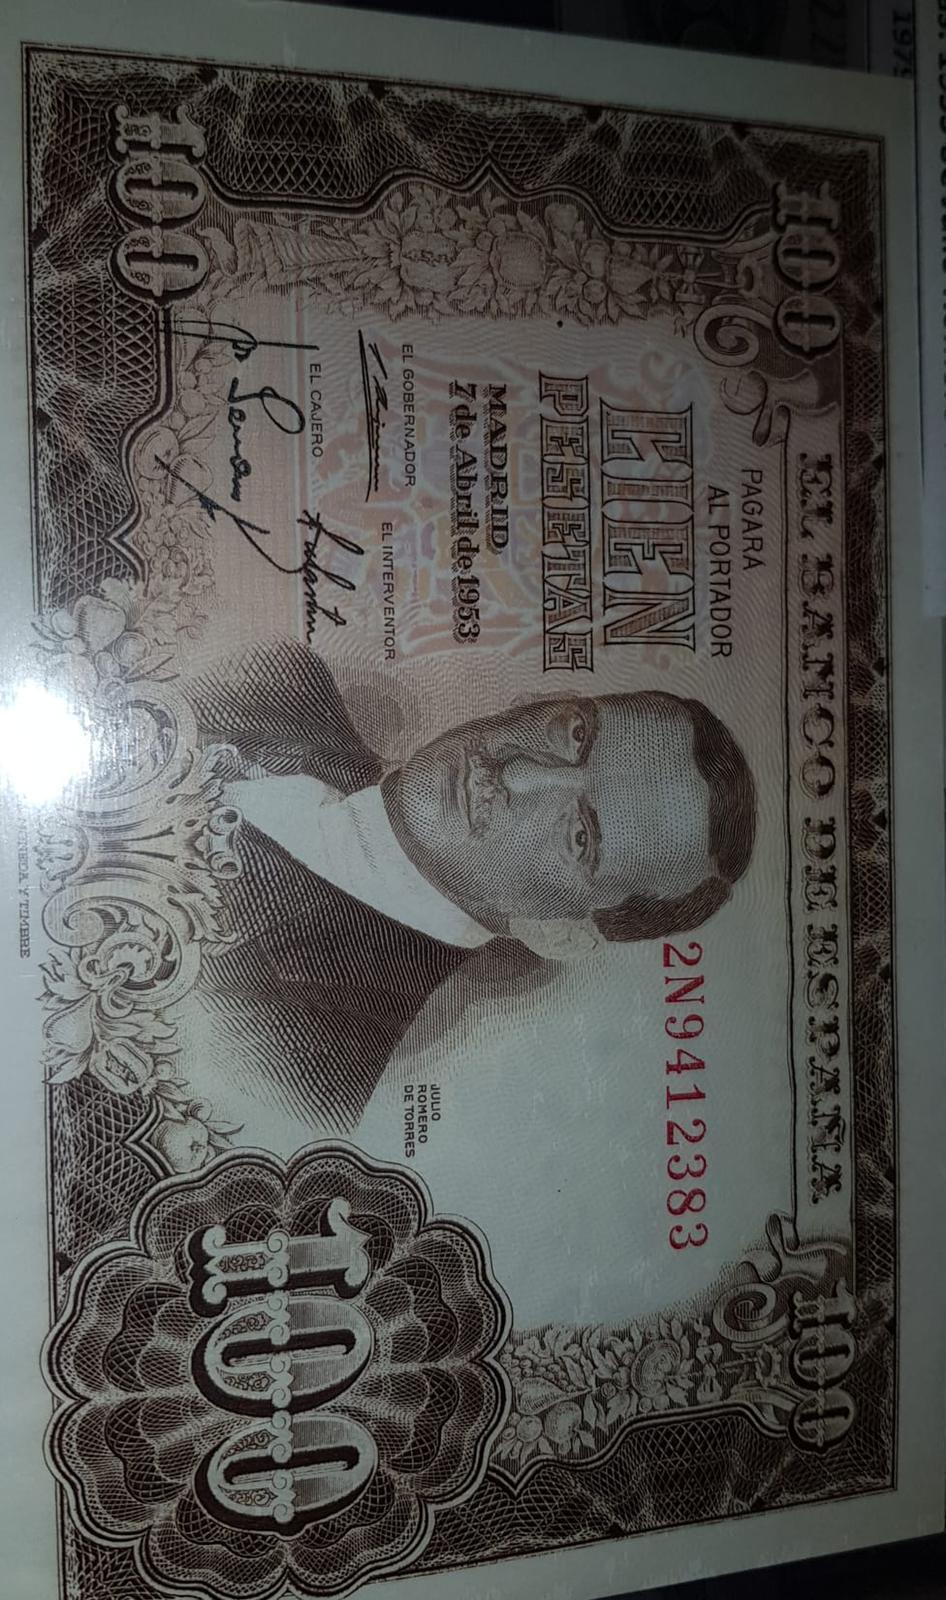 Investigación - Billetes de 100 pts 1953 Romero de Torres 100_pt18